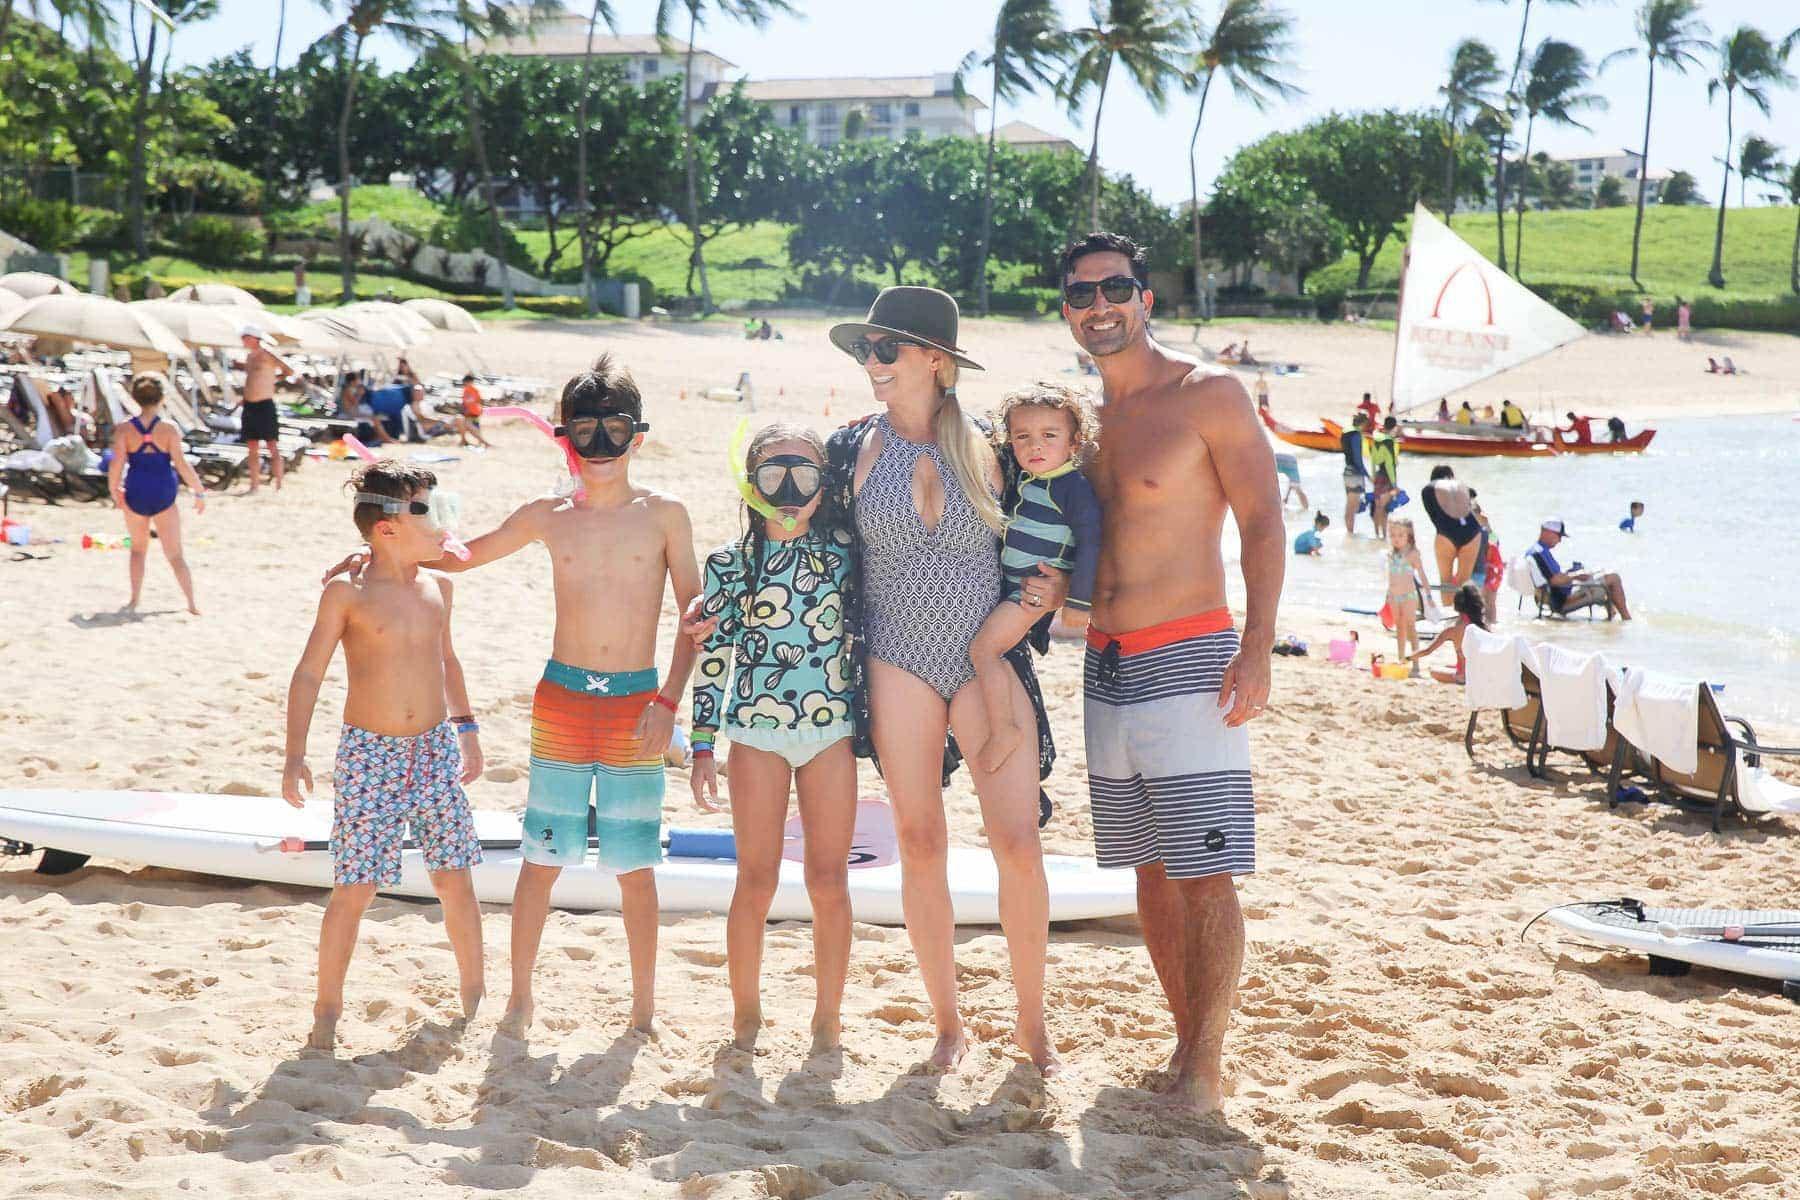 Happy Family on the Beach #kids #summertips #summerparentingtips #citygirlgonemom